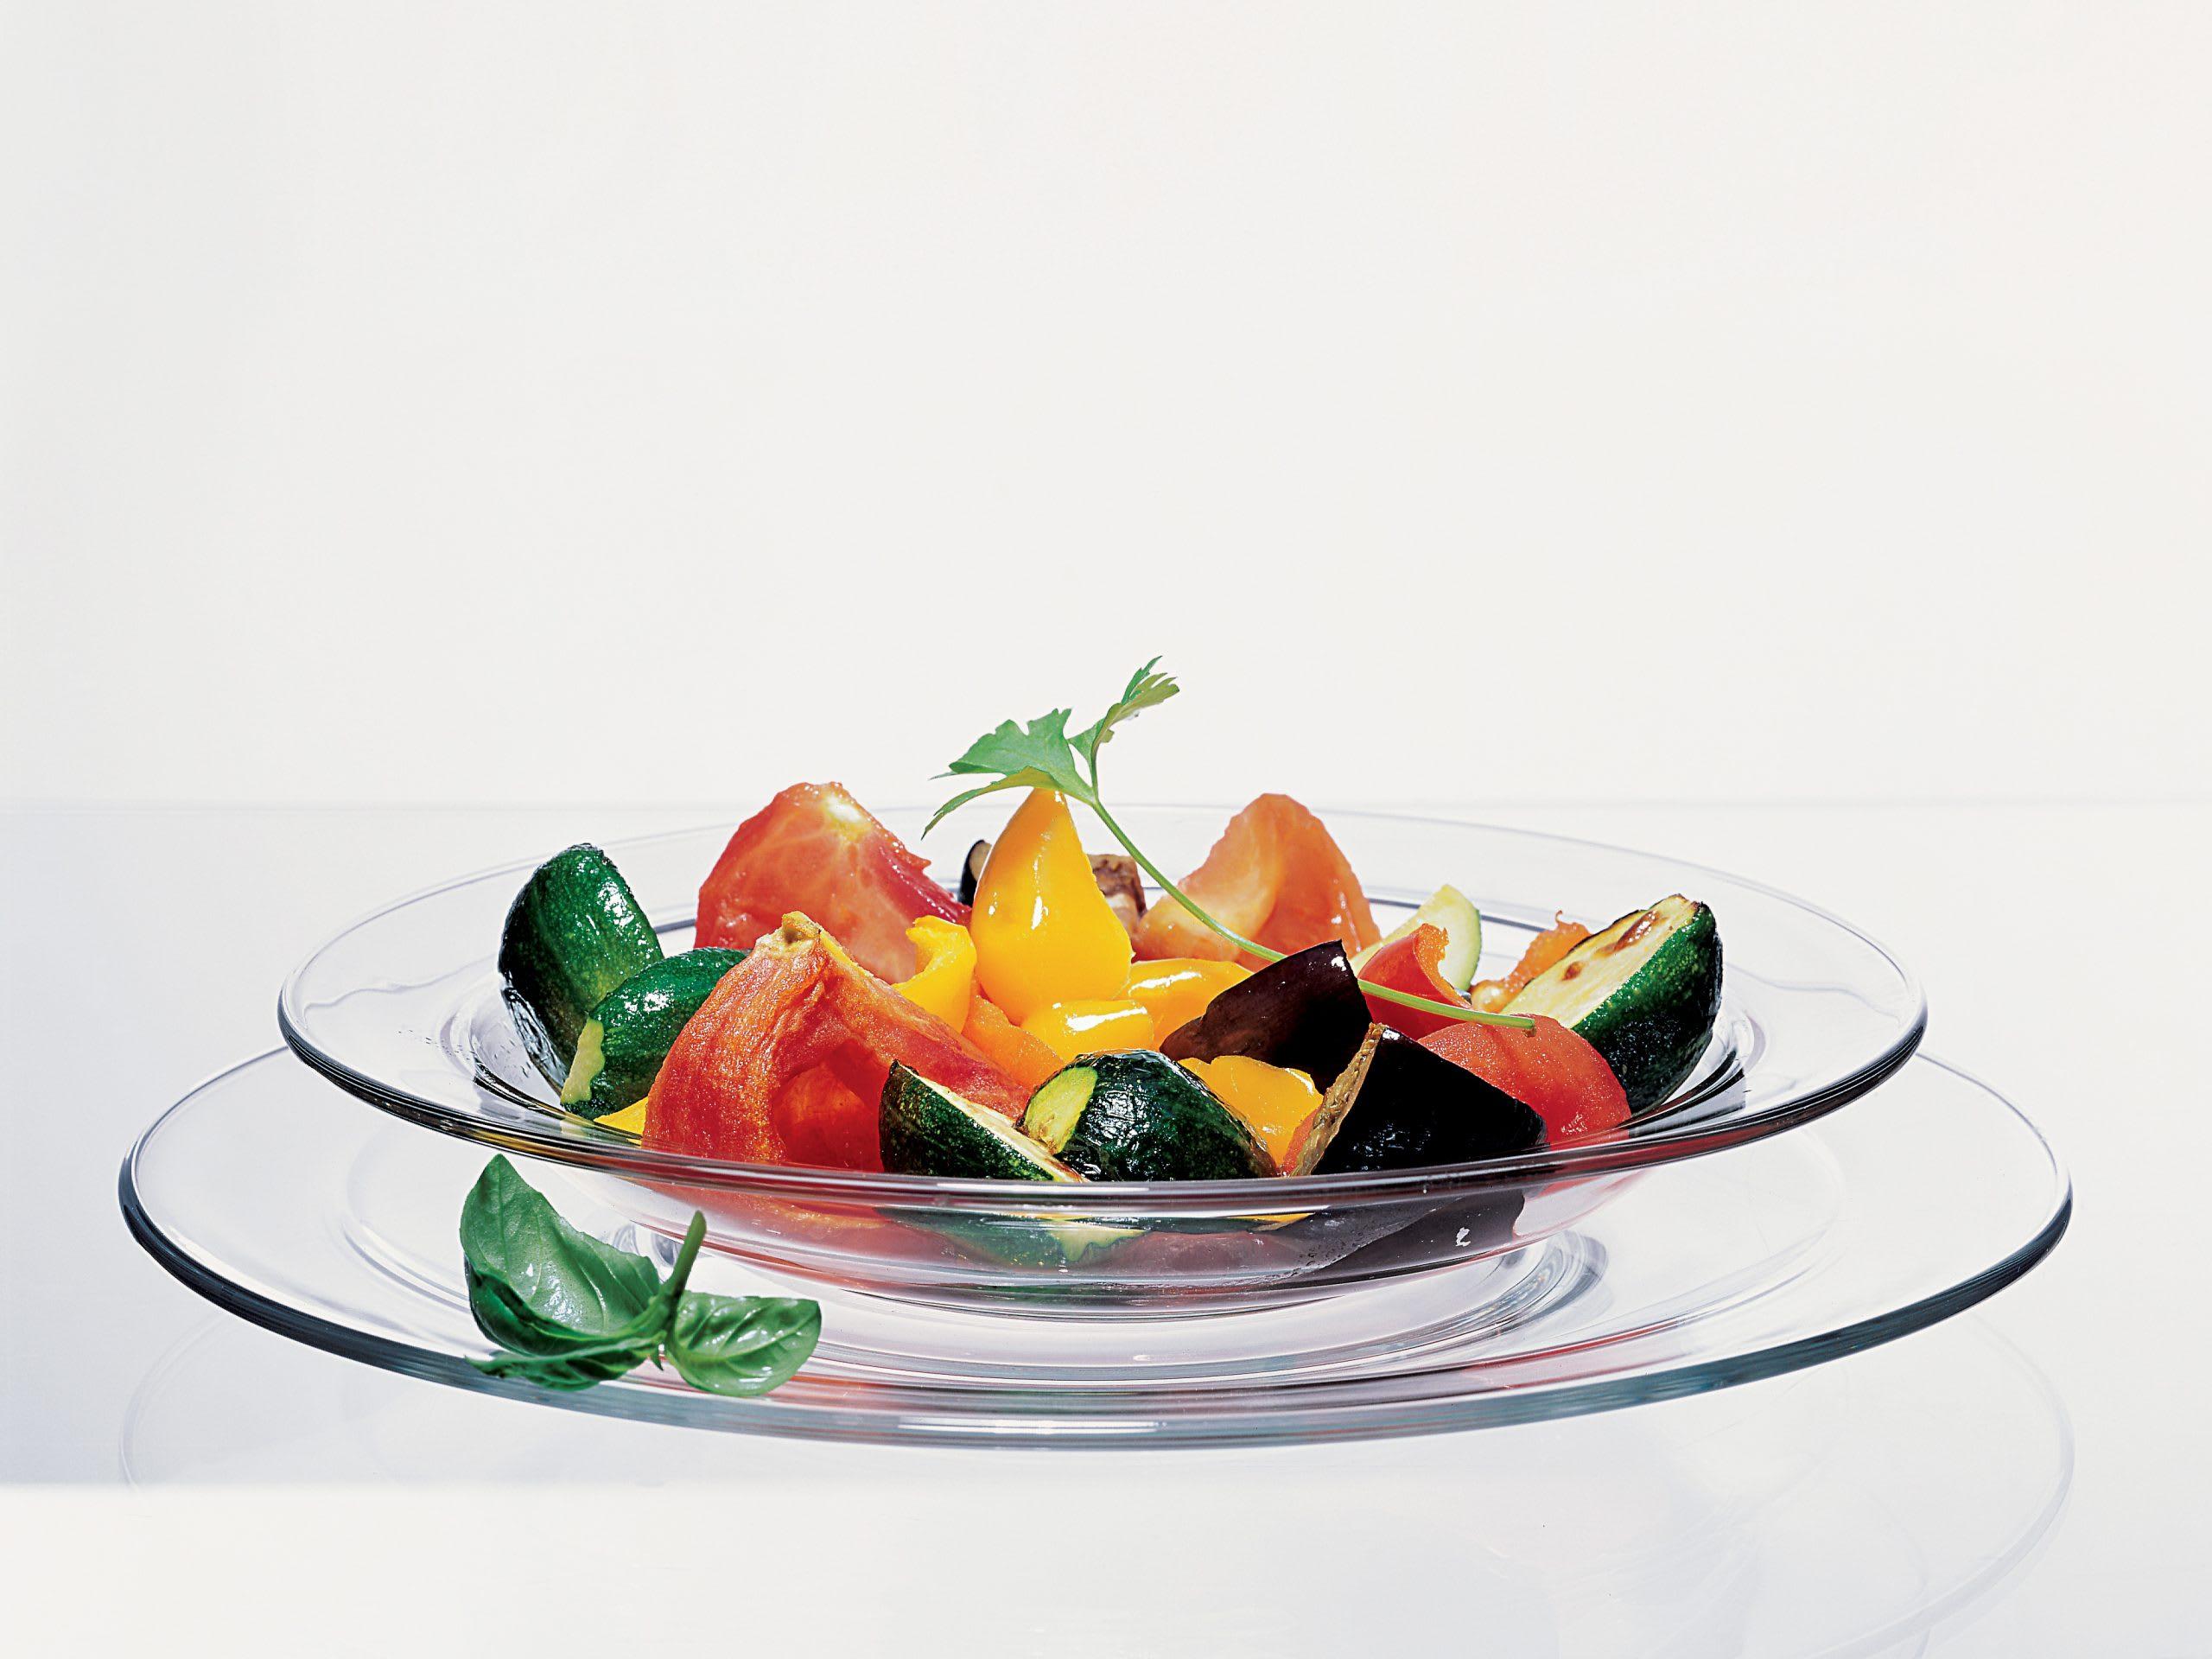 Salade d'été indien grillée